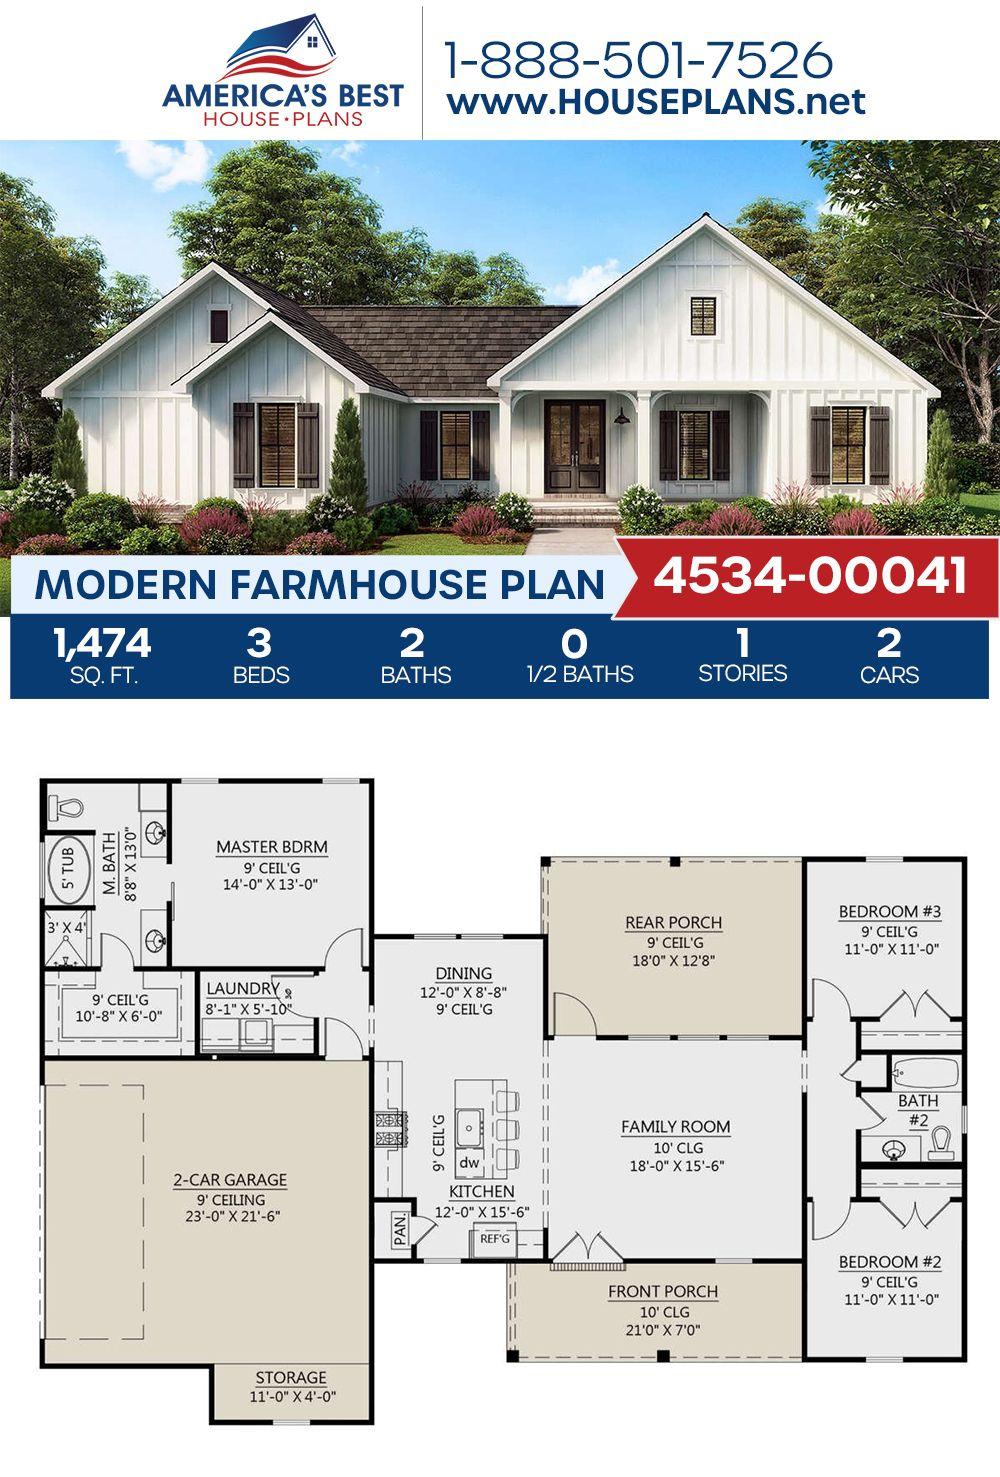 House Plan 4534 00041 Modern Farmhouse Plan 1 474 Square Feet 3 Bedrooms 2 Bathrooms Modern Farmhouse Plans Affordable House Plans Farmhouse Plans